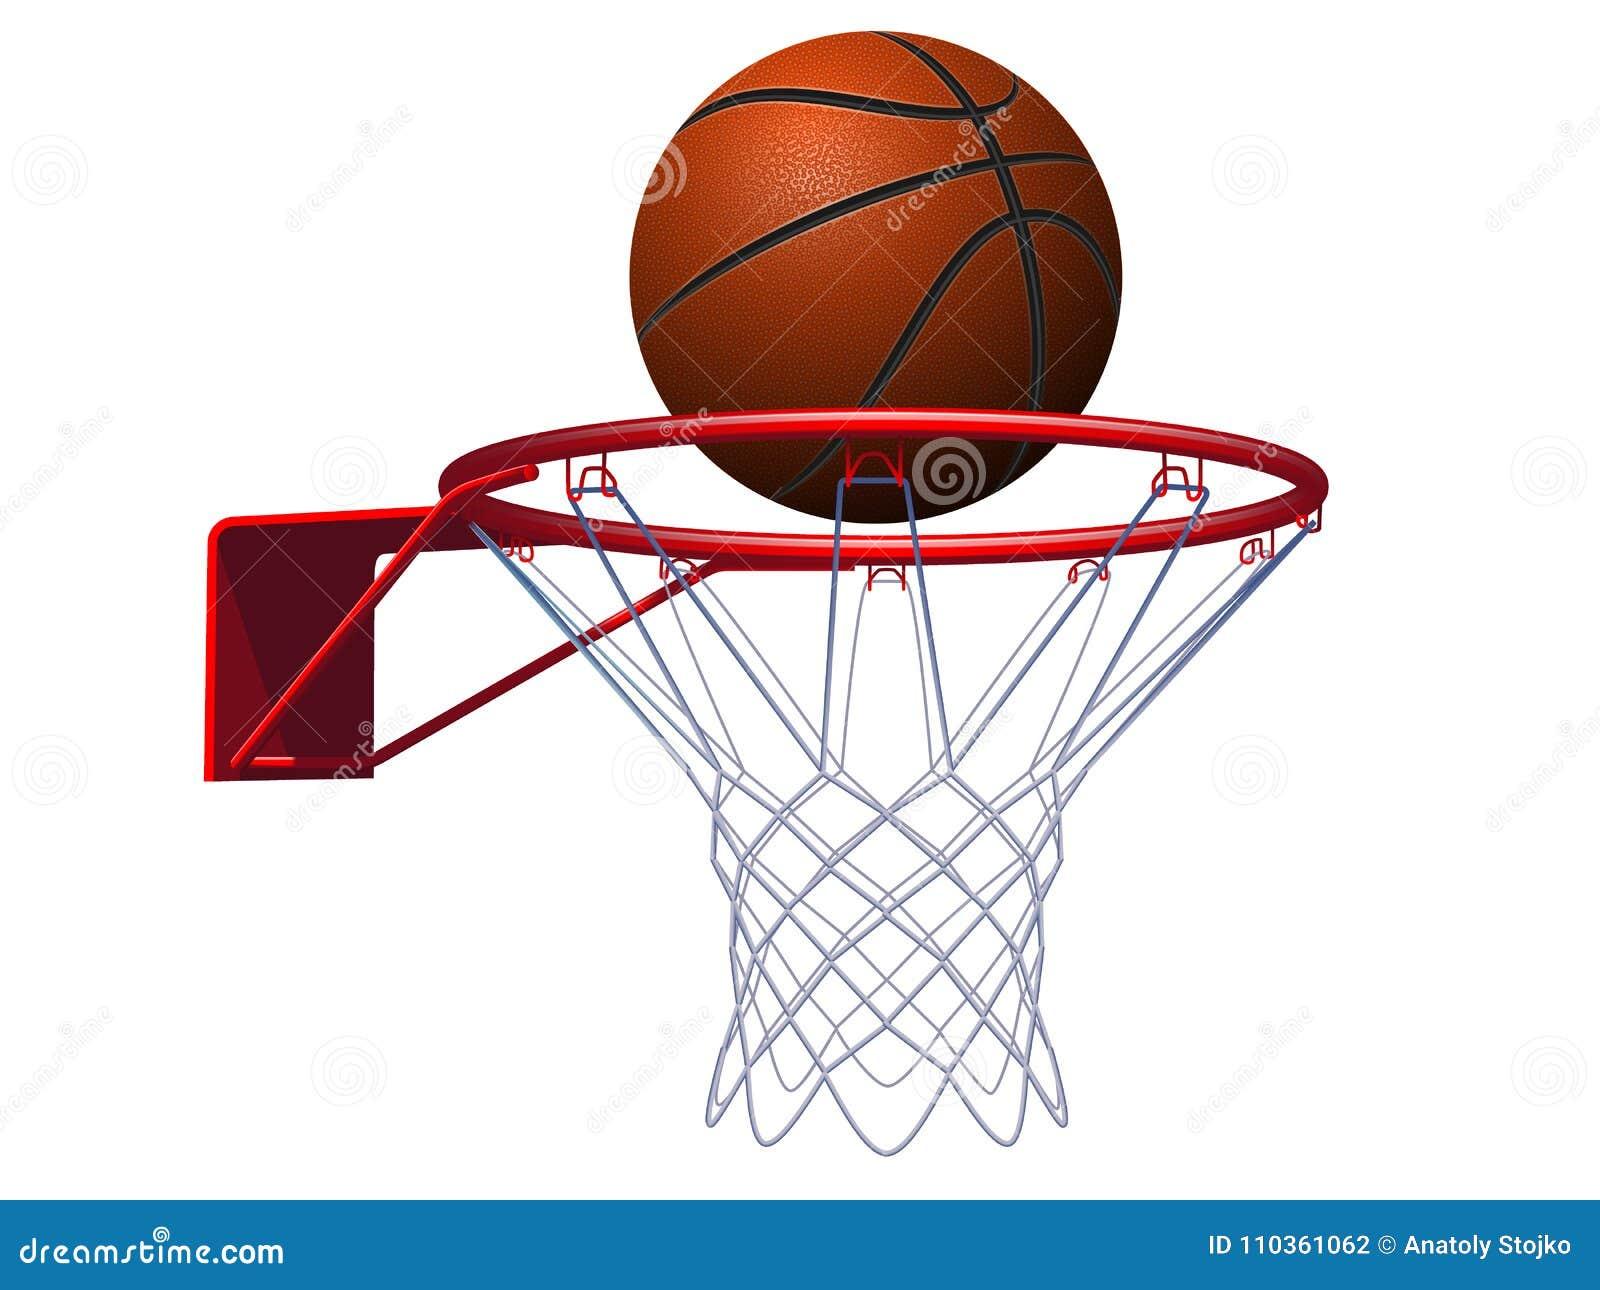 Basketball ball and hoop. Vector Illustration.